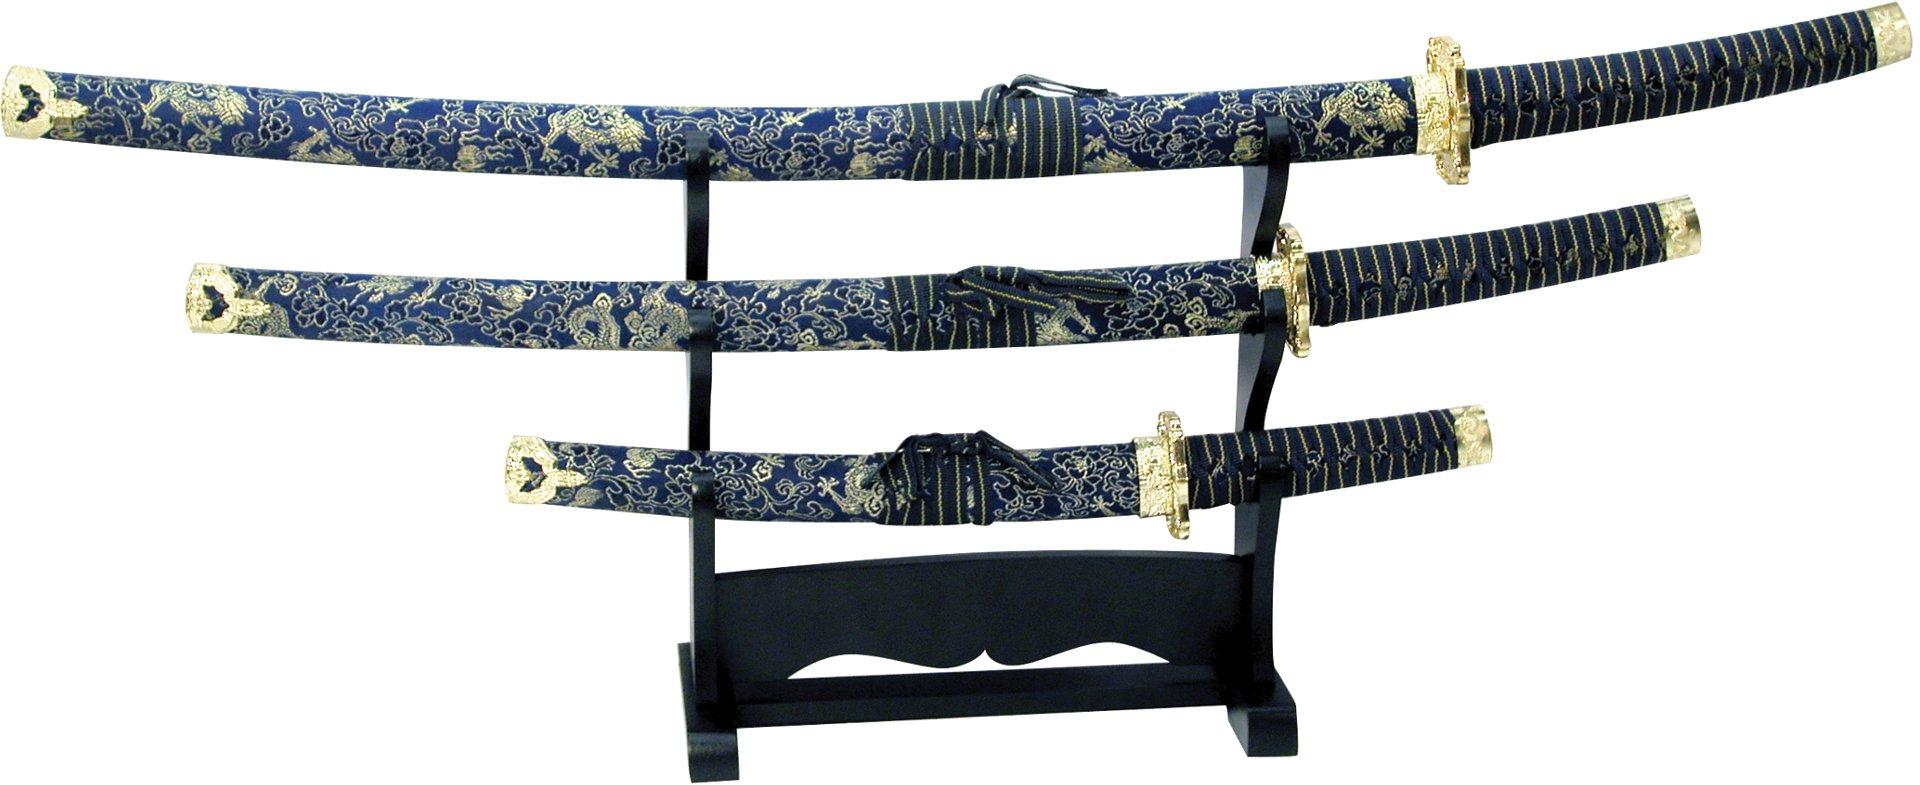 BladesUSA Jl 021Bl4 Samurai 3 Piece Scabbard